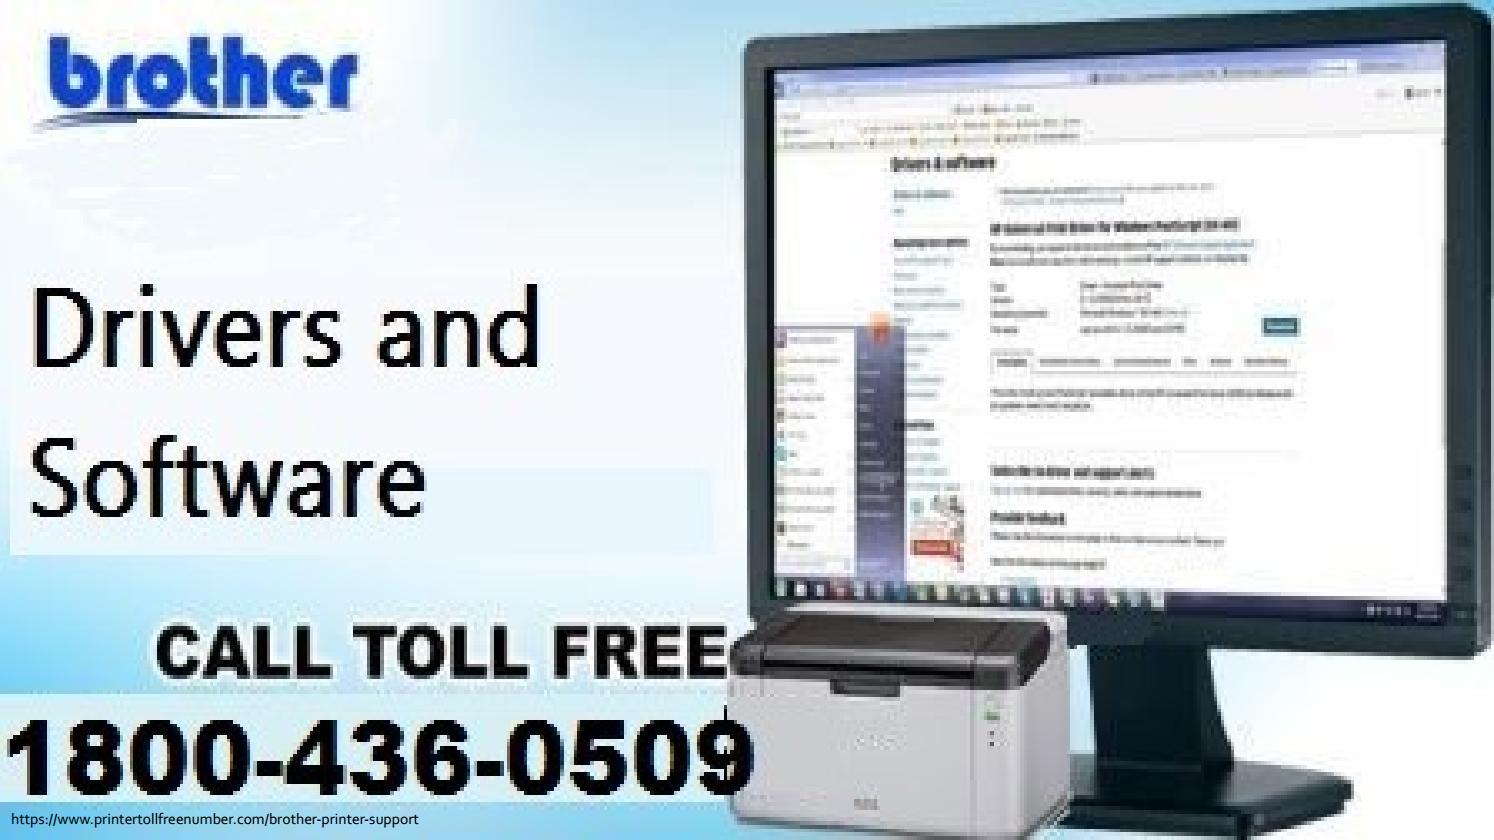 Download Brother Printer Driver 1800-436-0509 Brother printer